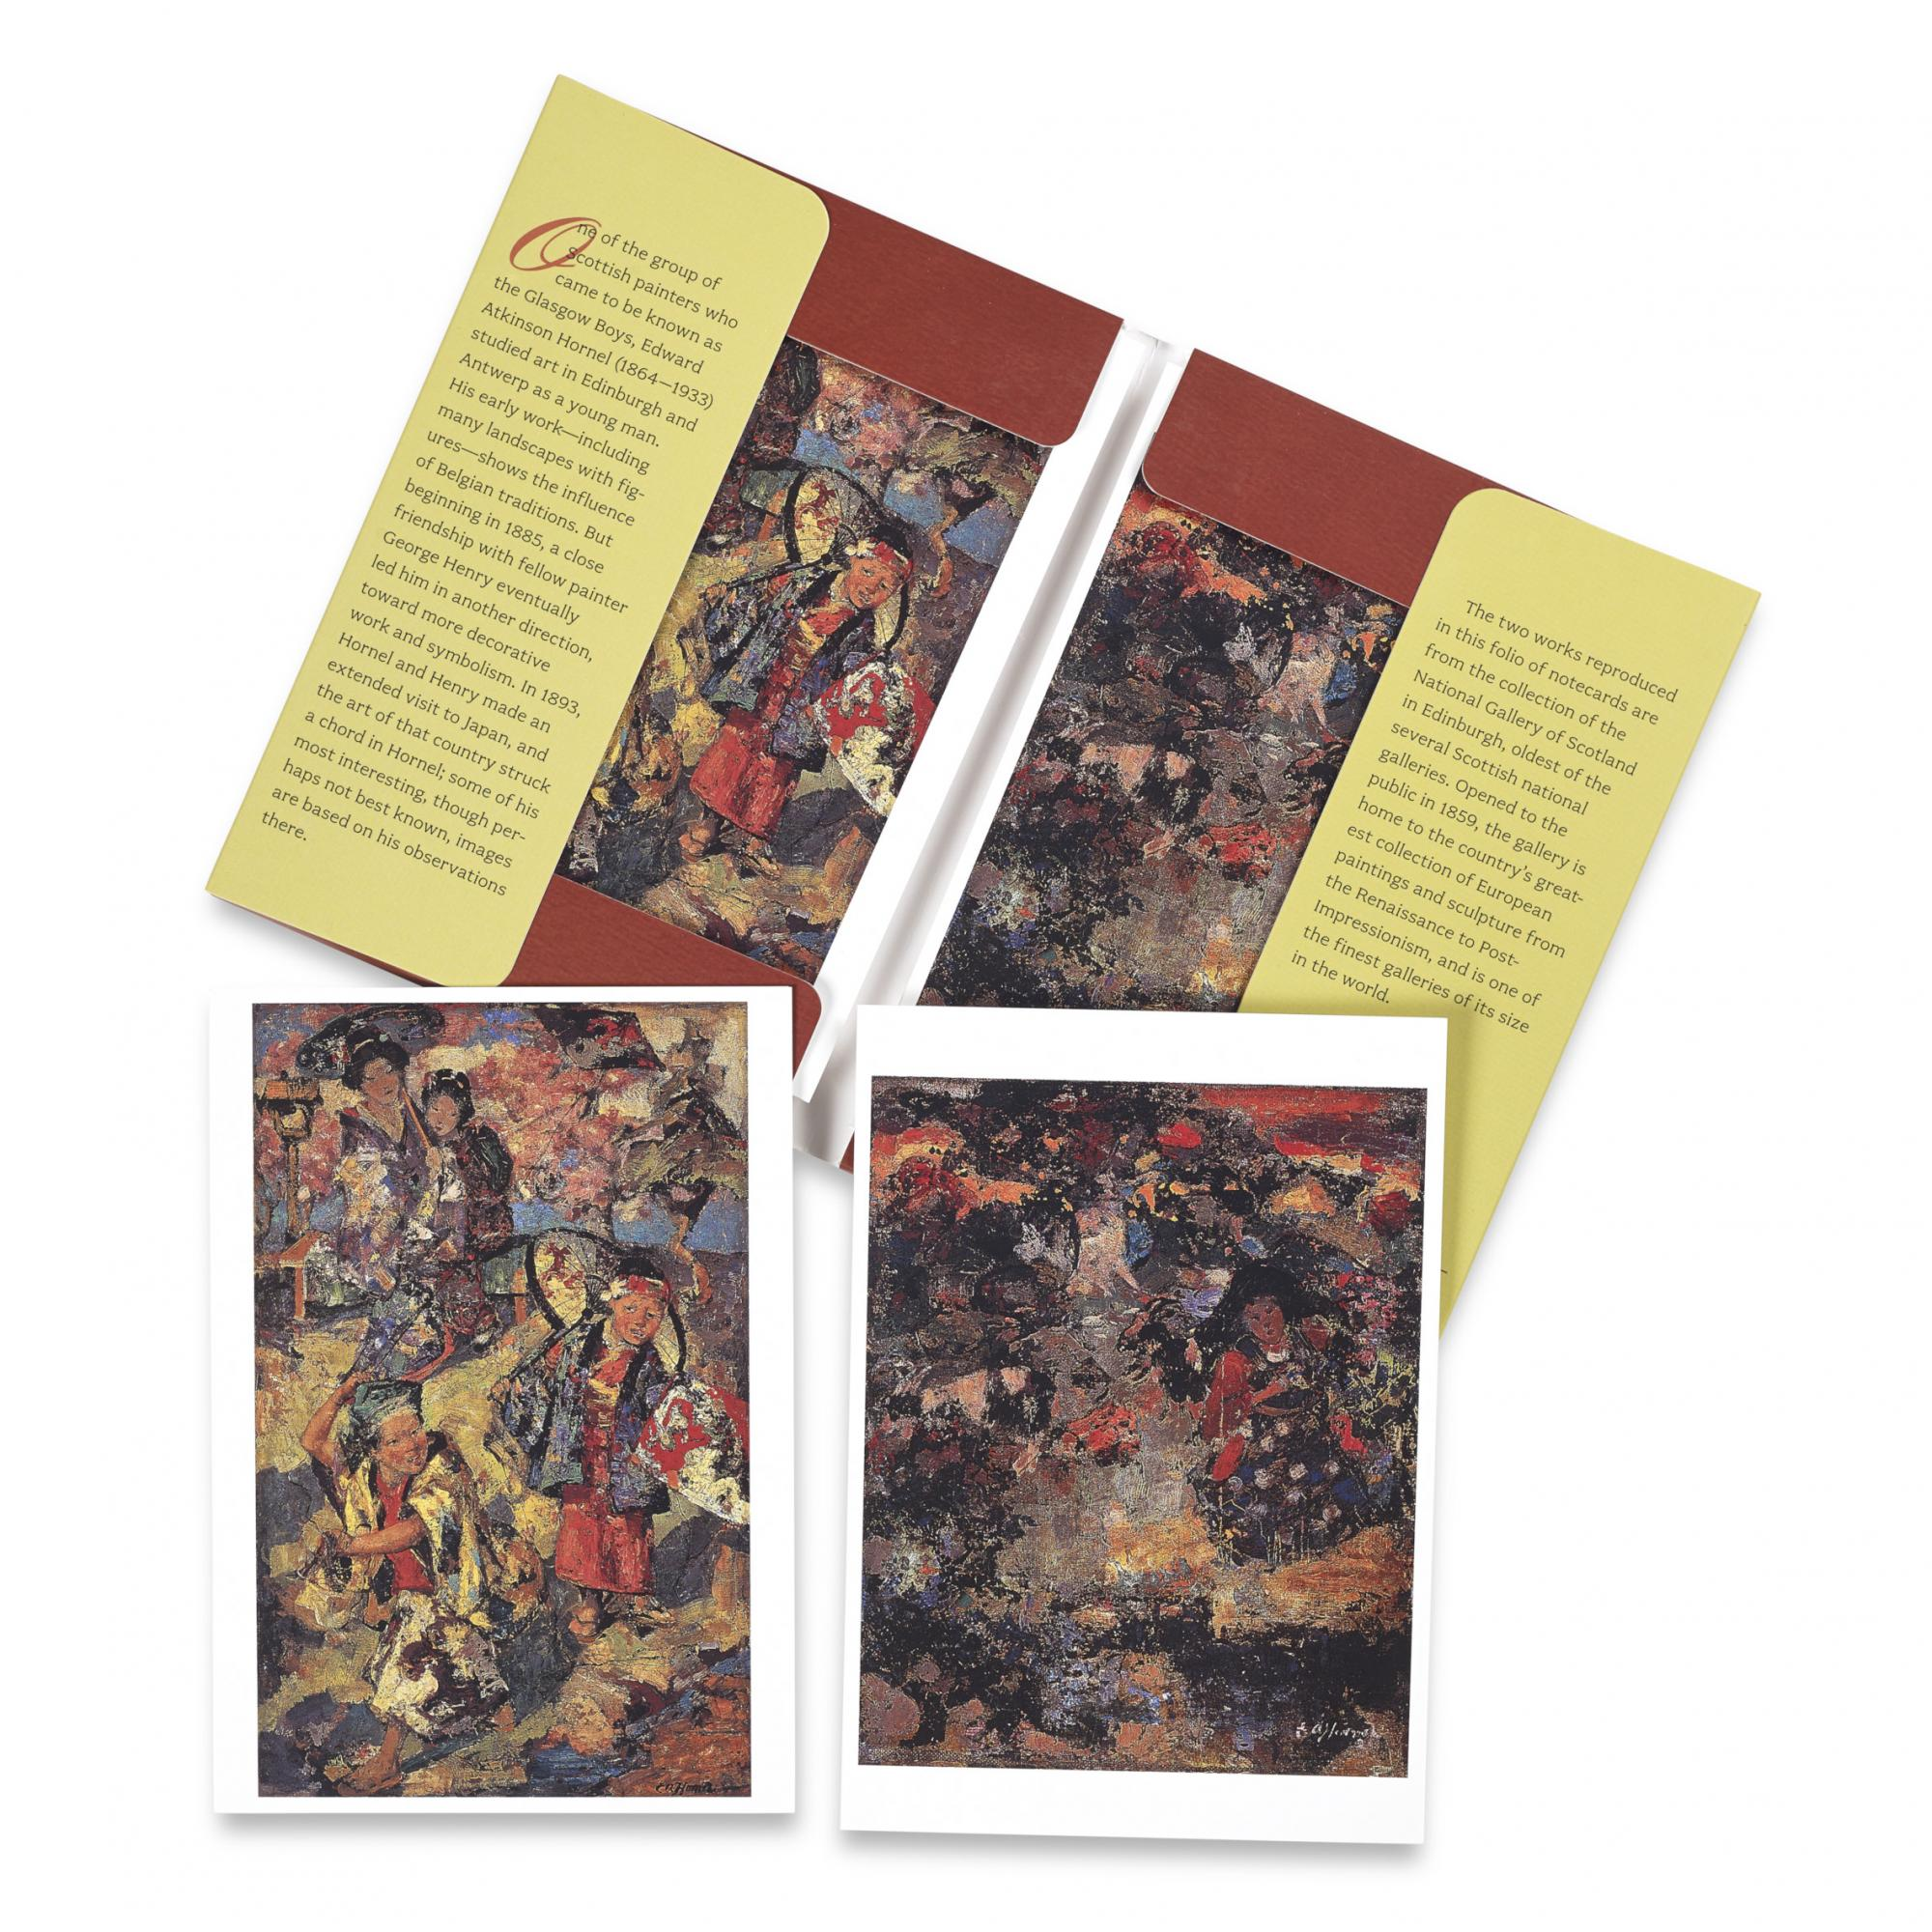 Edward Atkinson Hornel notecard set (10 cards)